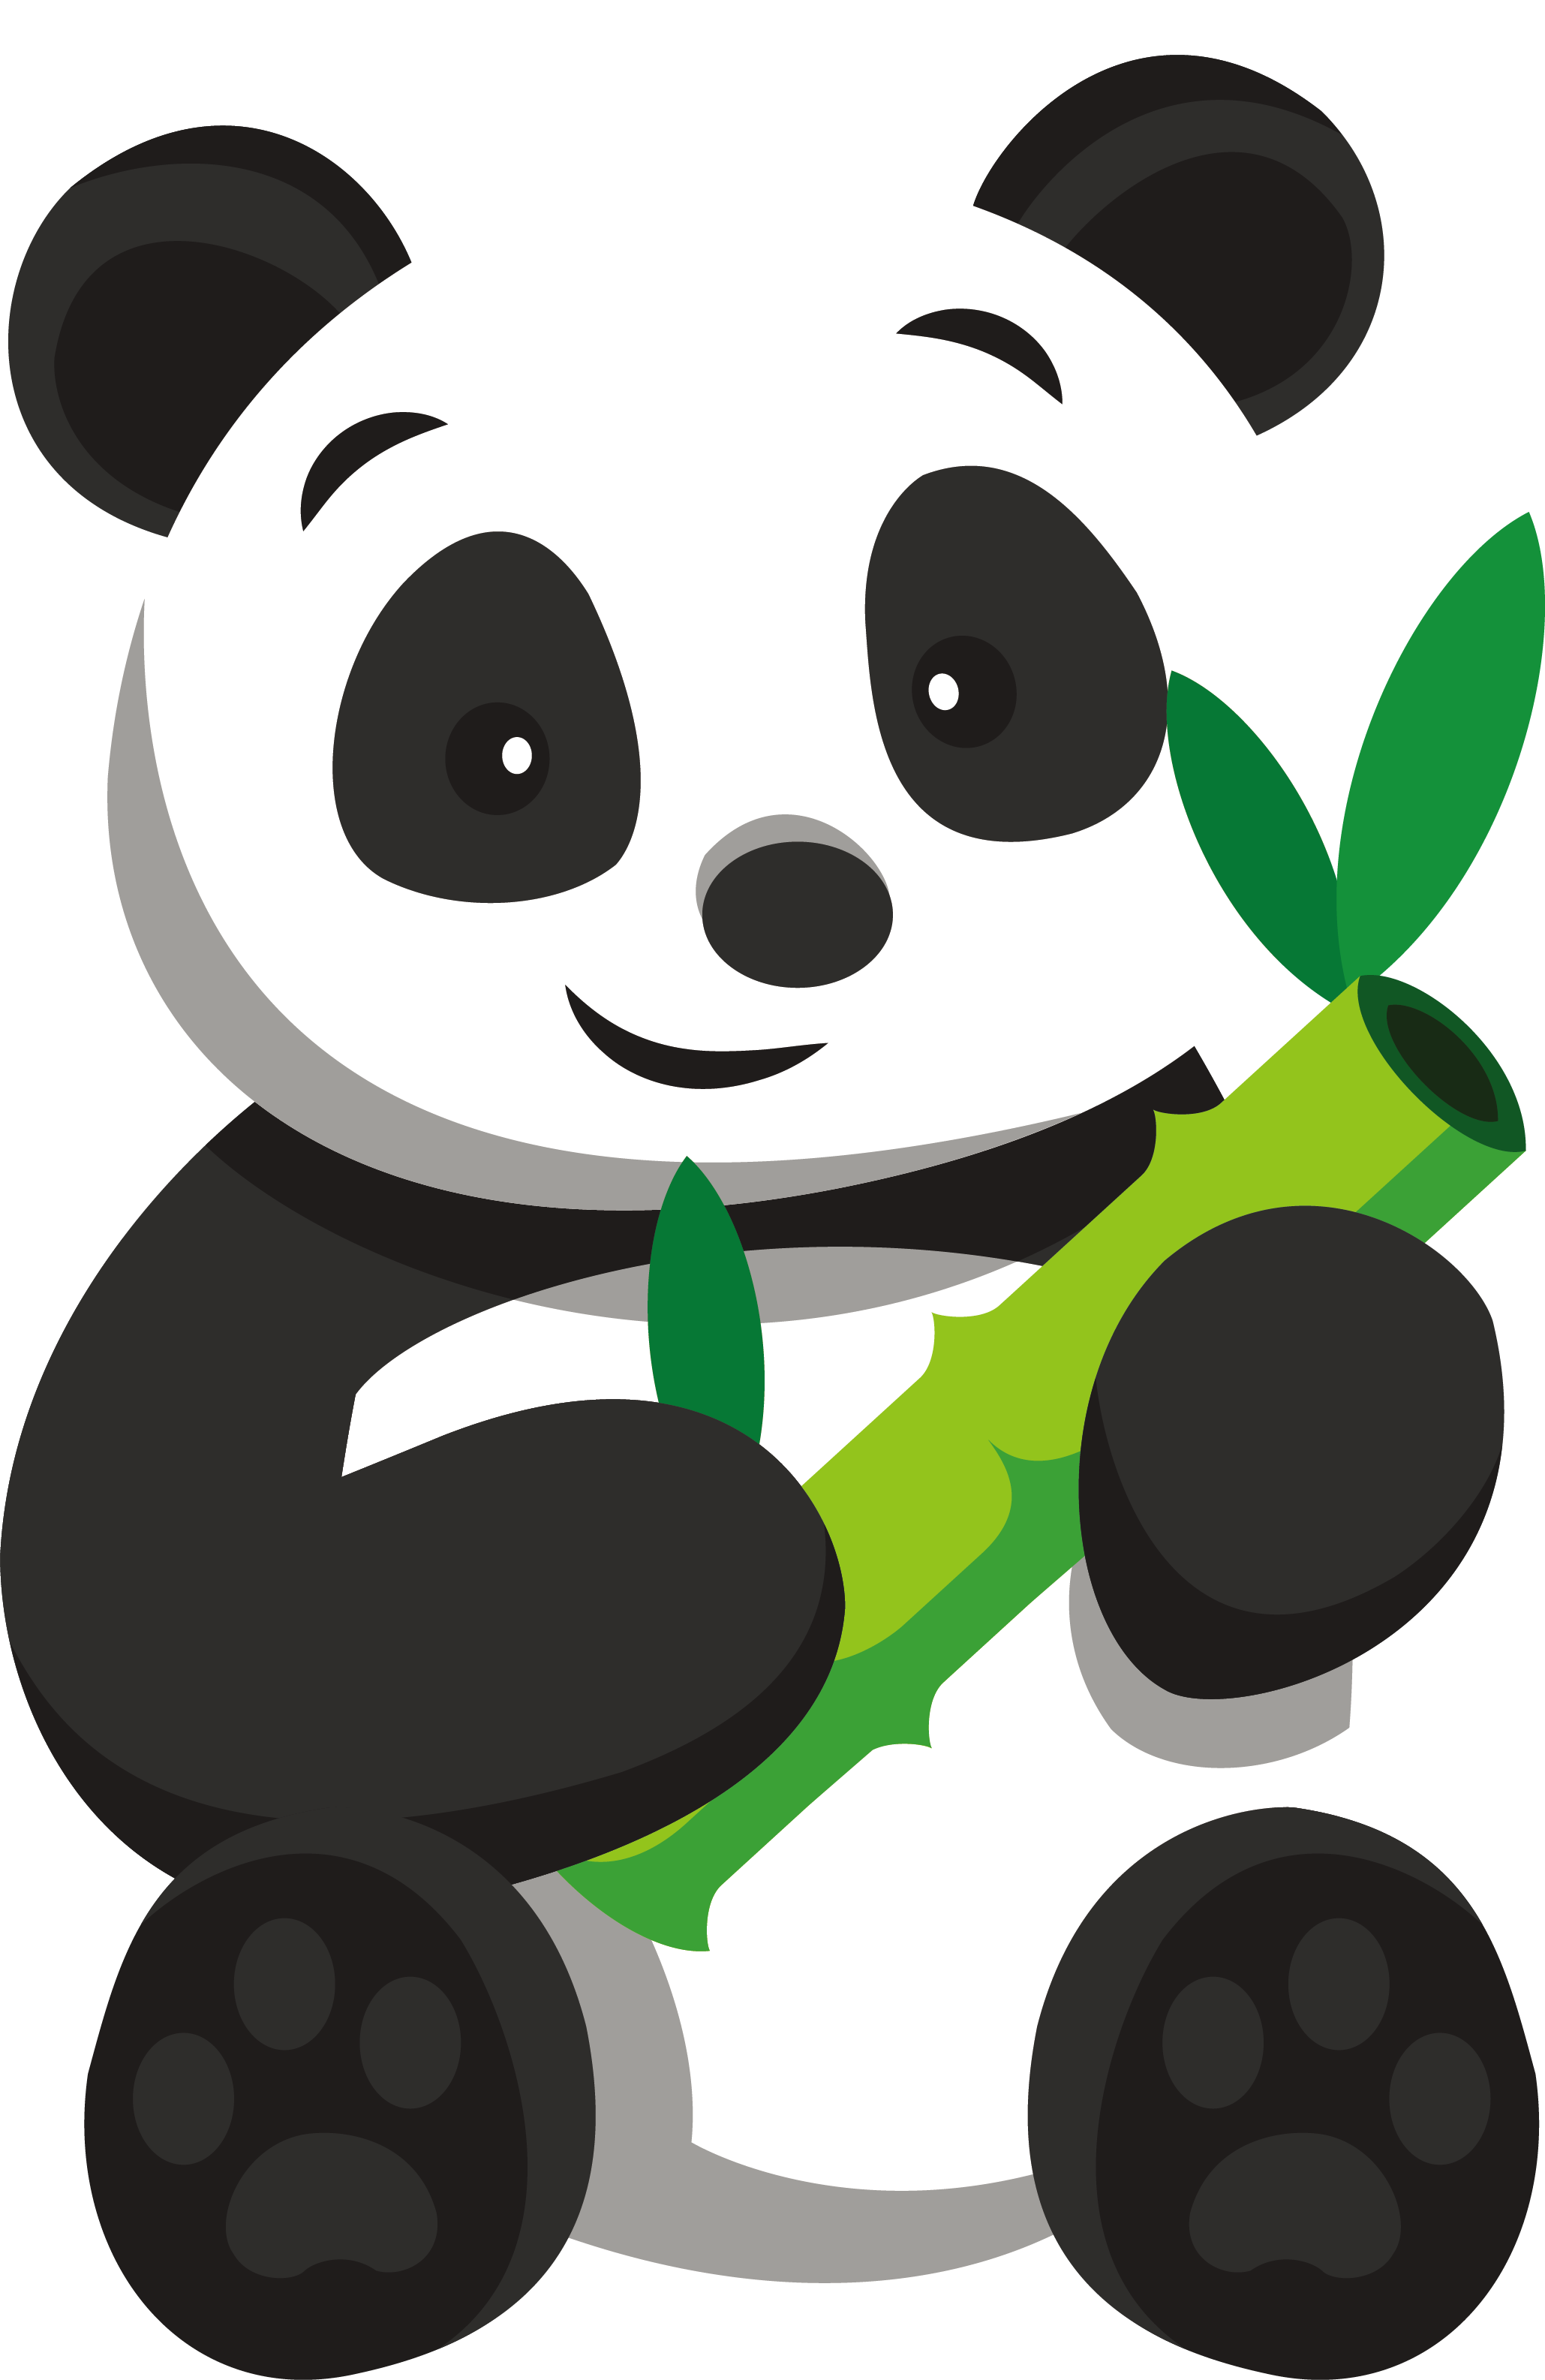 Bear and tree clipart clip freeuse library Giant panda Panda House restaurant Bear Clip art - Bamboo Panda 2059 ... clip freeuse library